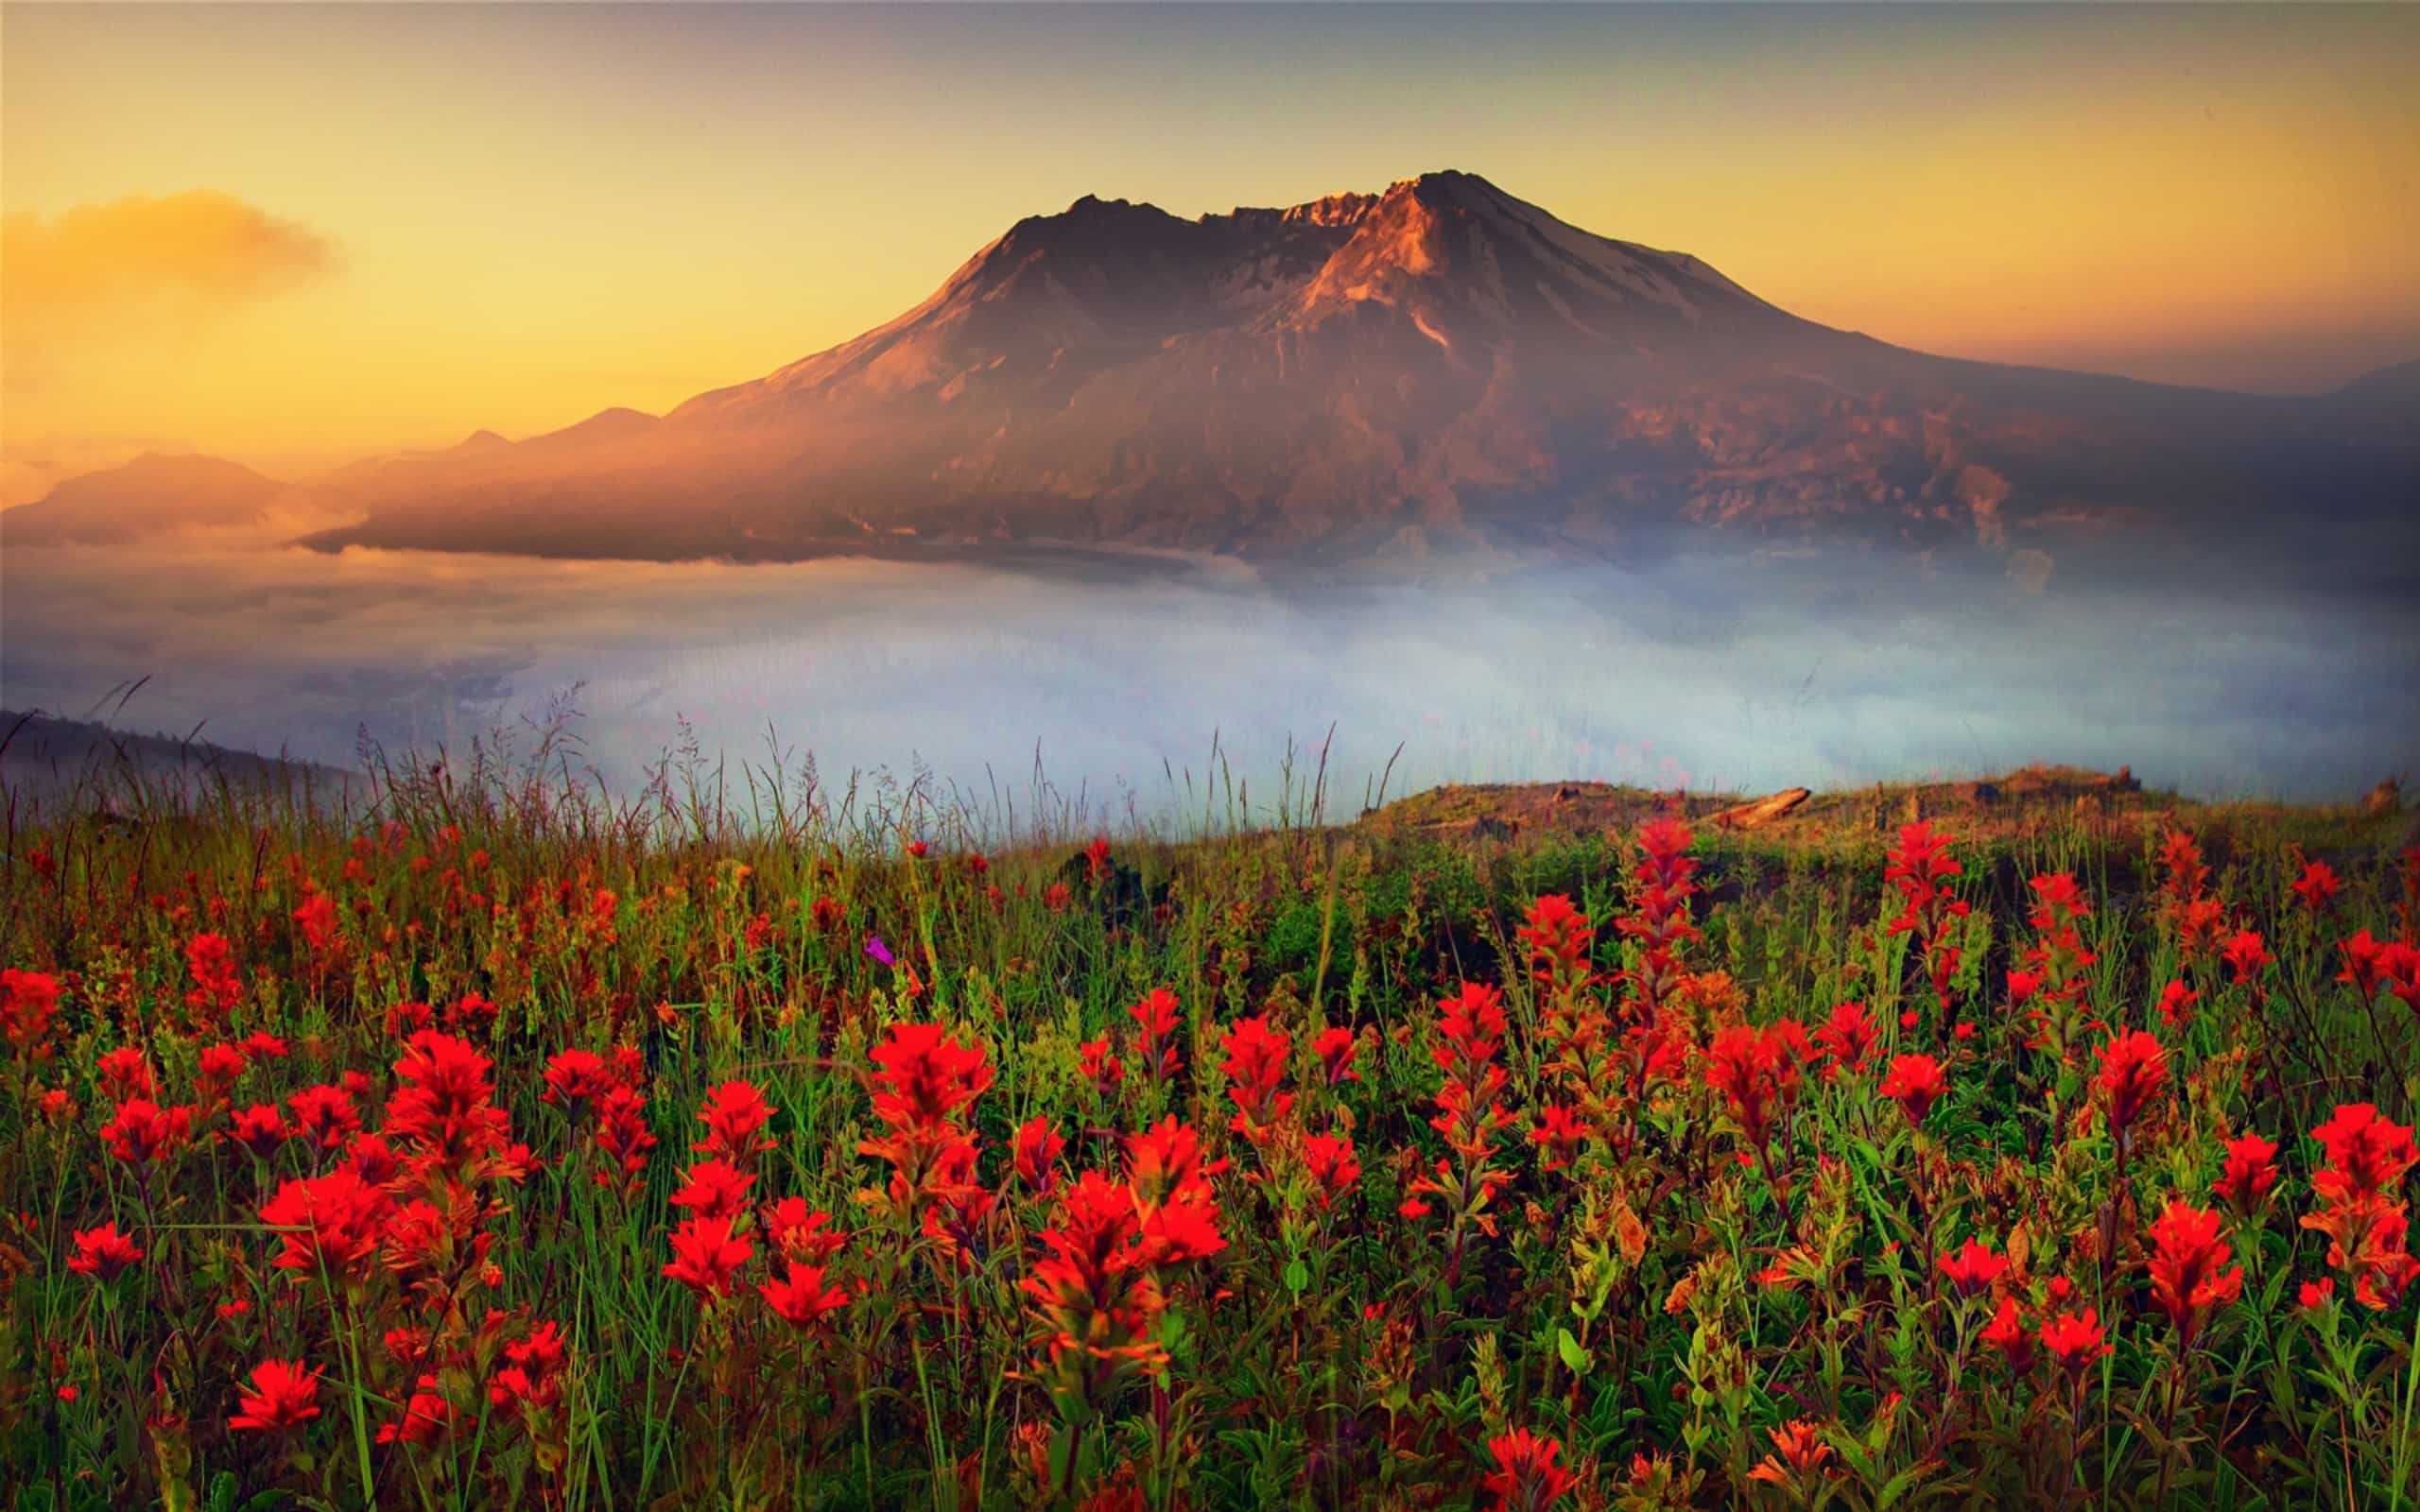 Best 48 Mount St Helens Wallpaper on HipWallpaper Amount 2560x1600